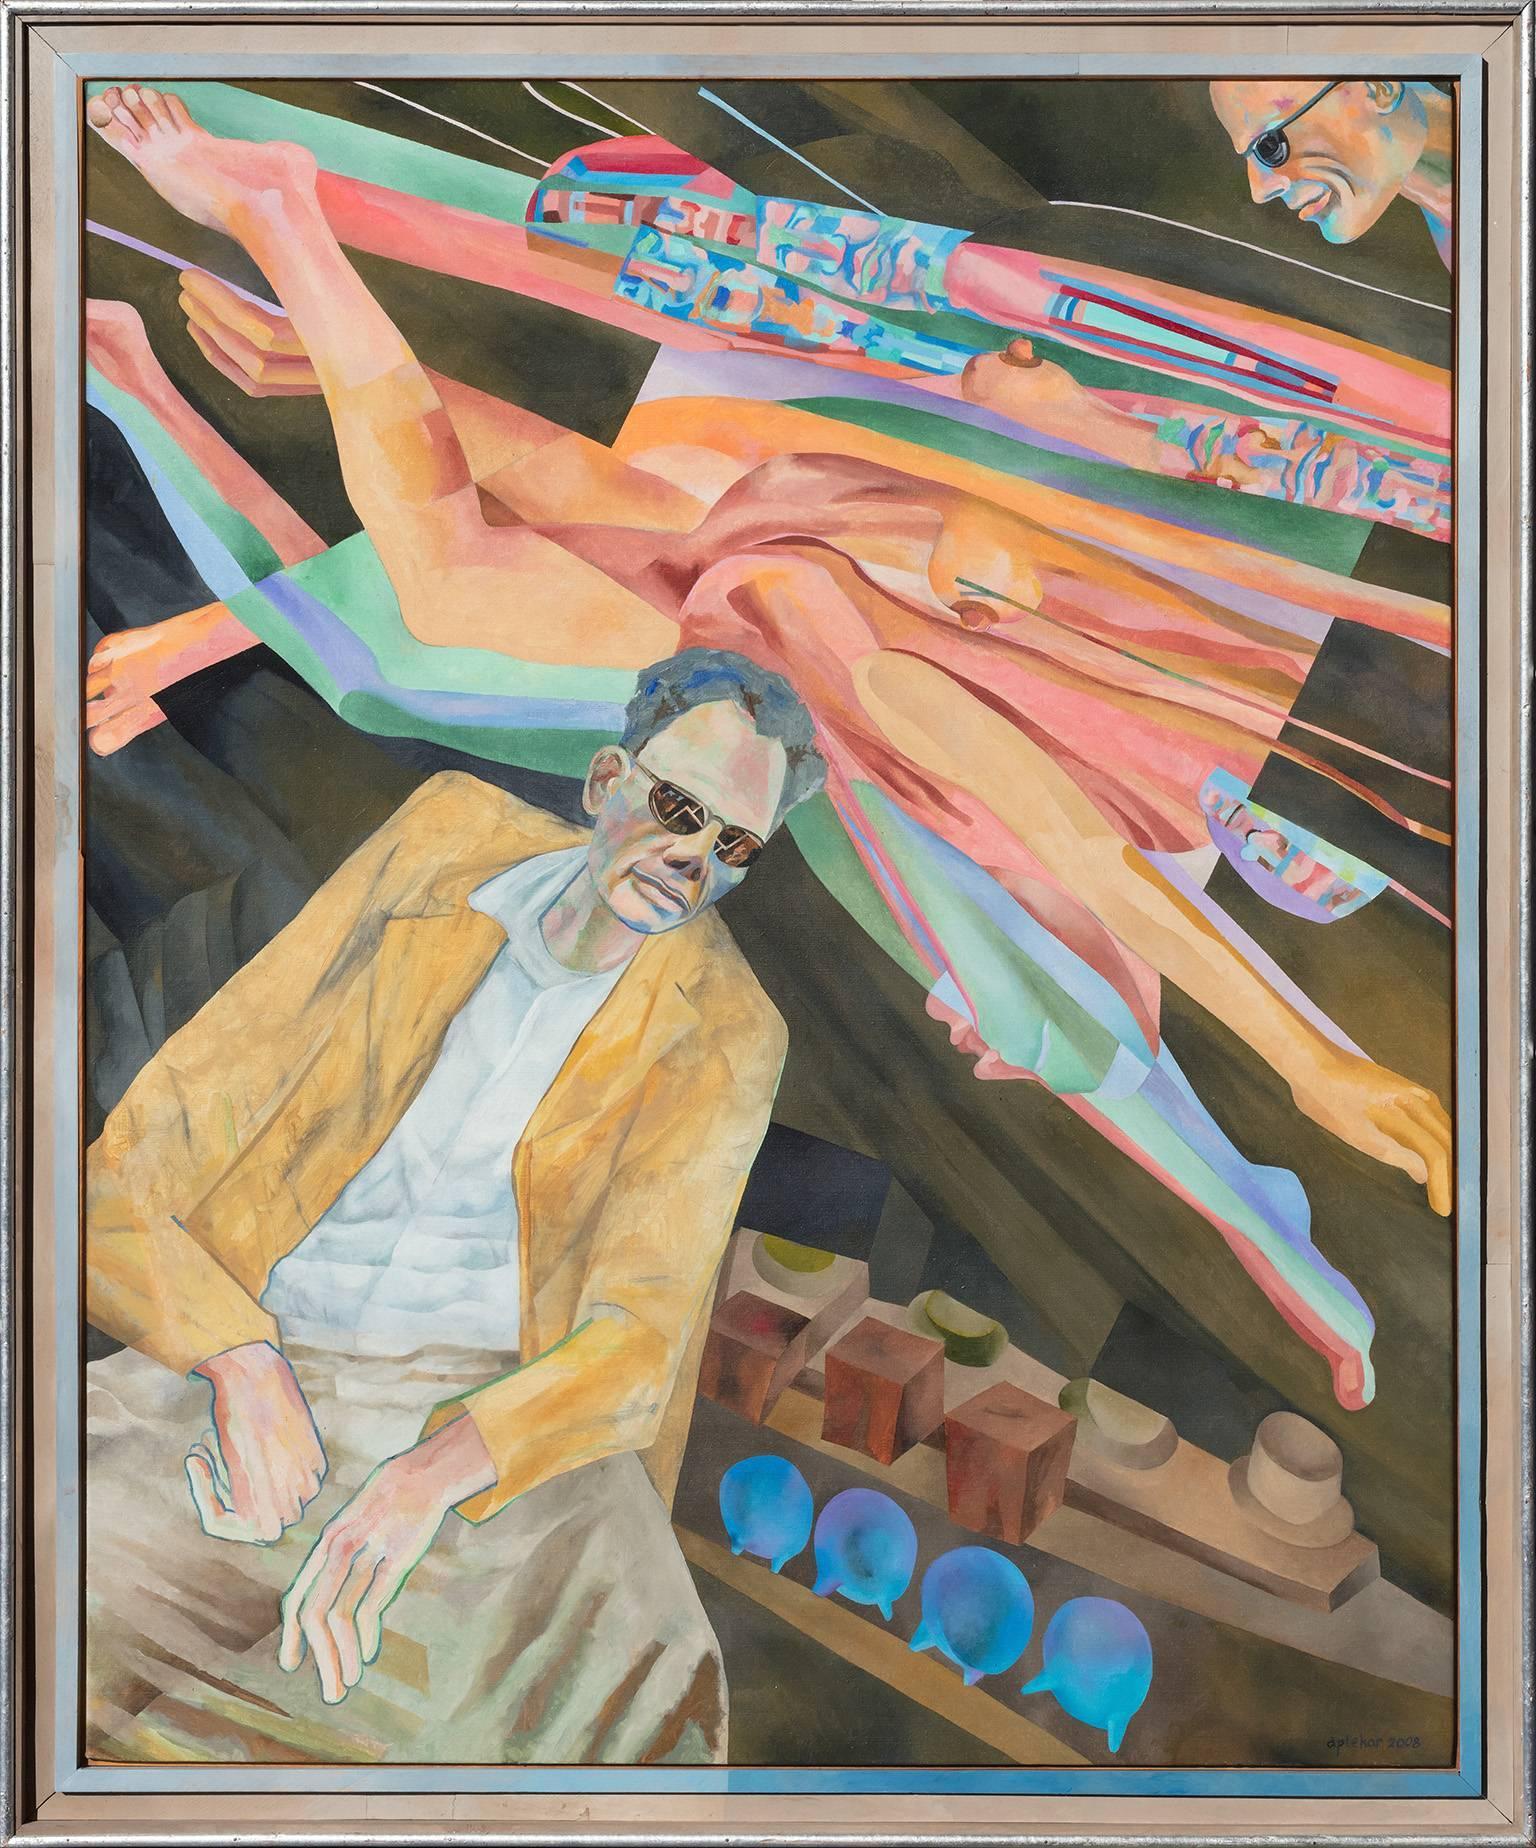 Arthur Miller Thinks - Expressionist Figurative Painting of Arthur Miller